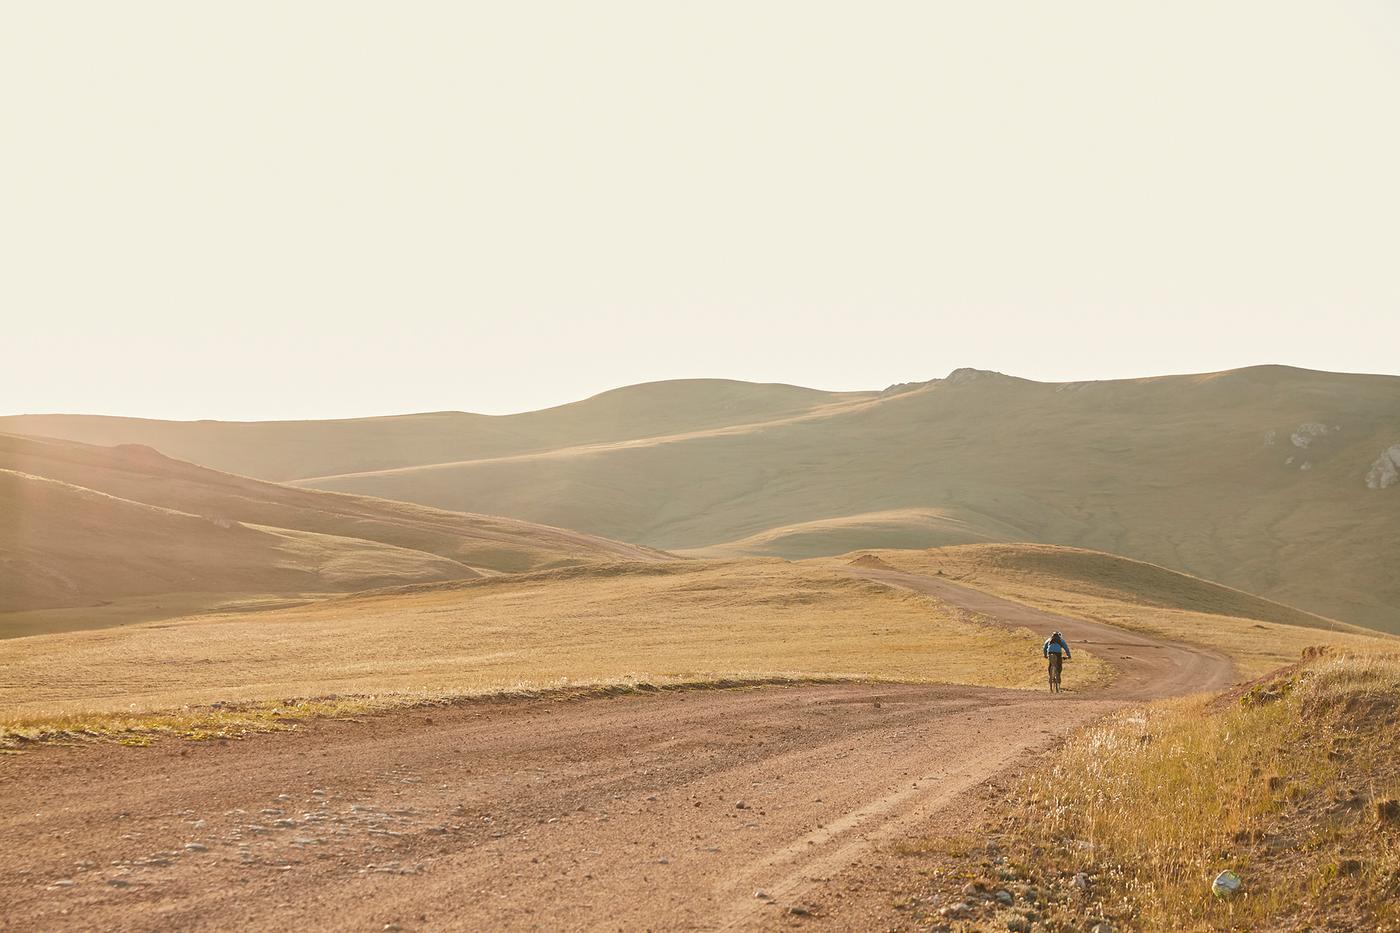 Silk Road Mountain Race 2019: Race Report 2